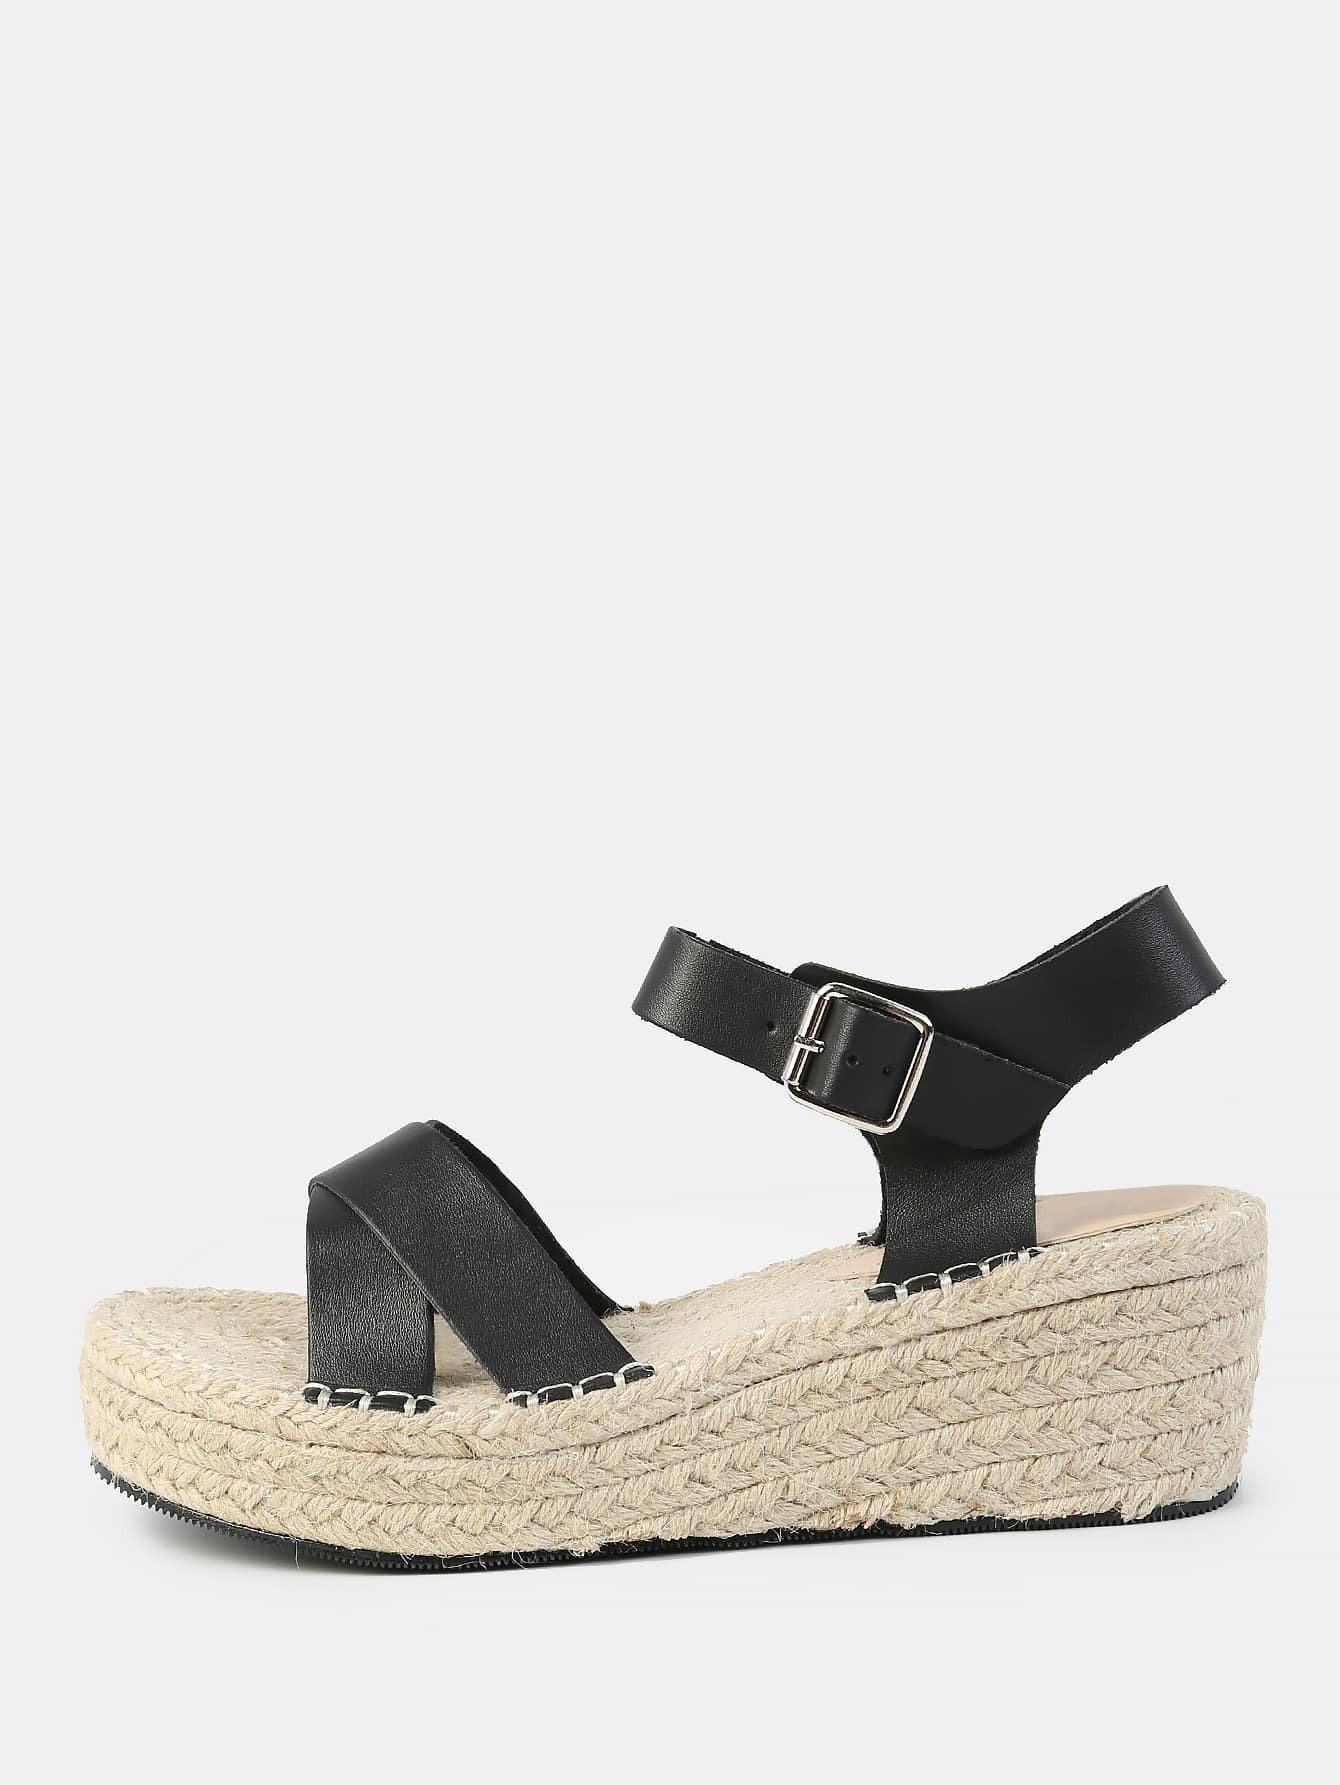 6cd709162f1 Cross Strap Espadrille Flatform Sandals BLACK EmmaCloth-Women Fast ...